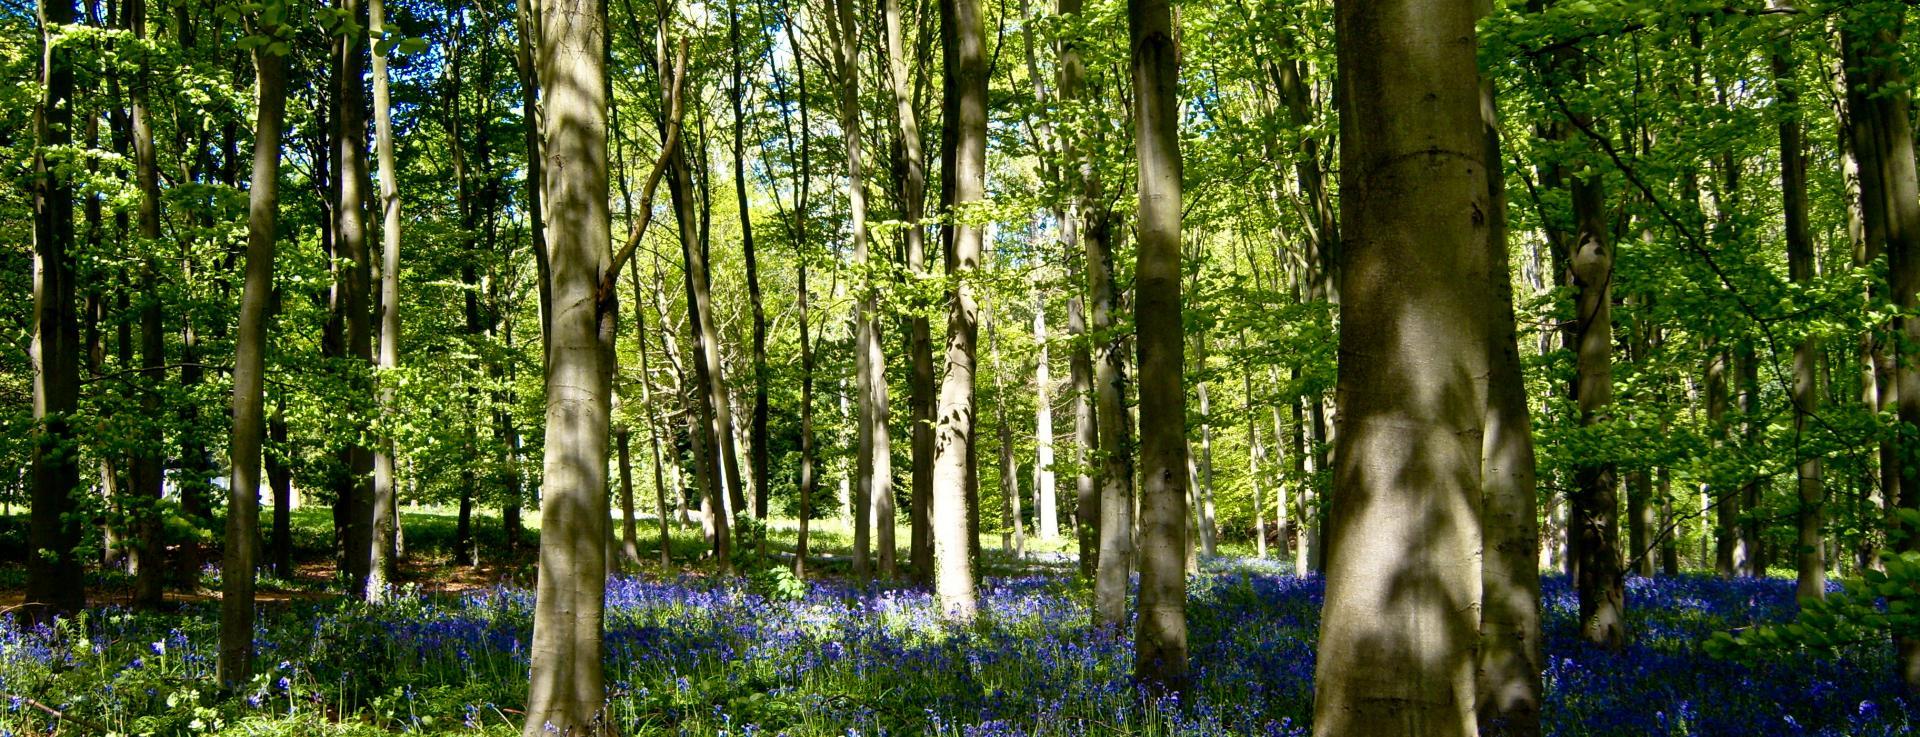 Bluebells on the Whittern Estate